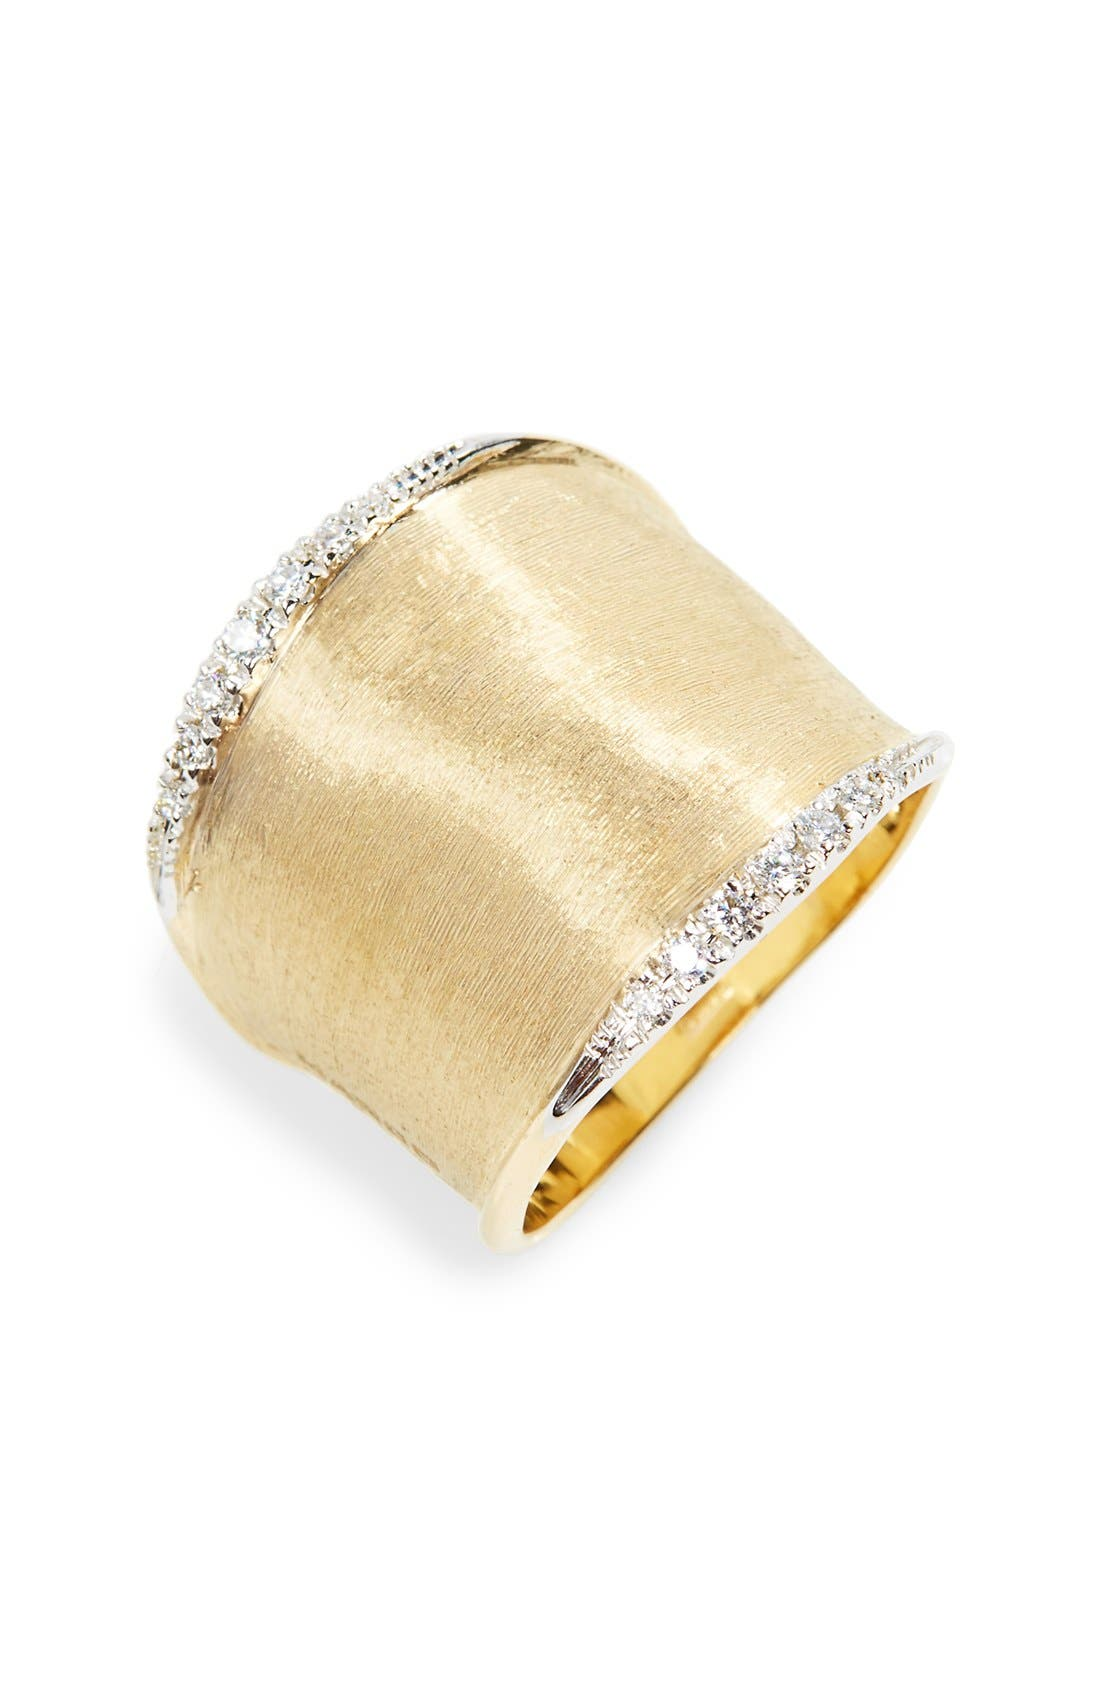 MARCO BICEGO LUNARIA DIAMOND BAND RING